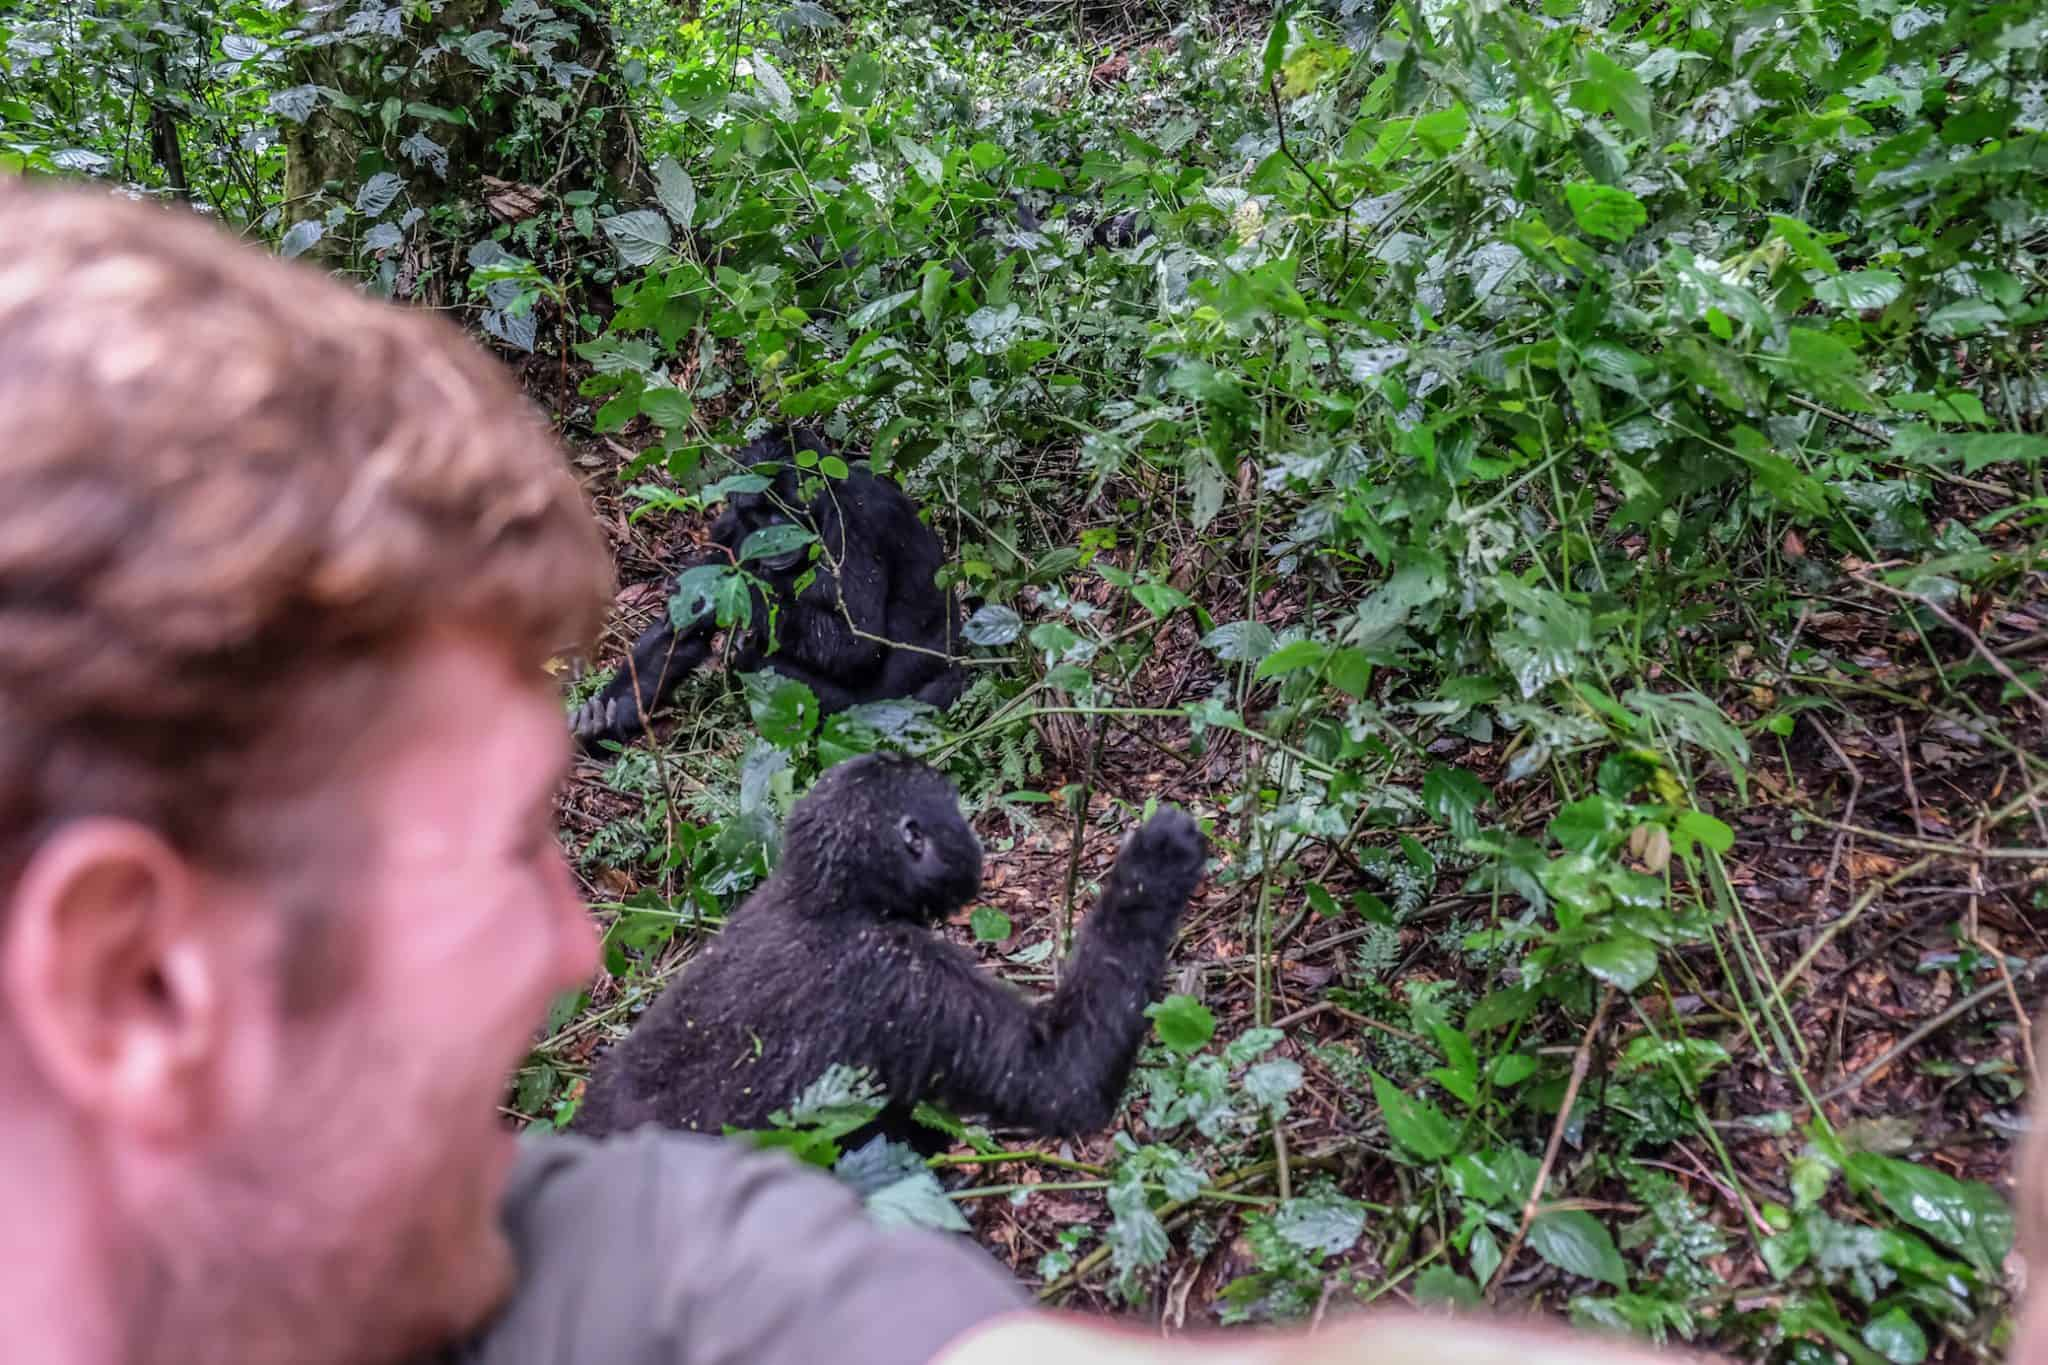 Trekking for gorillas